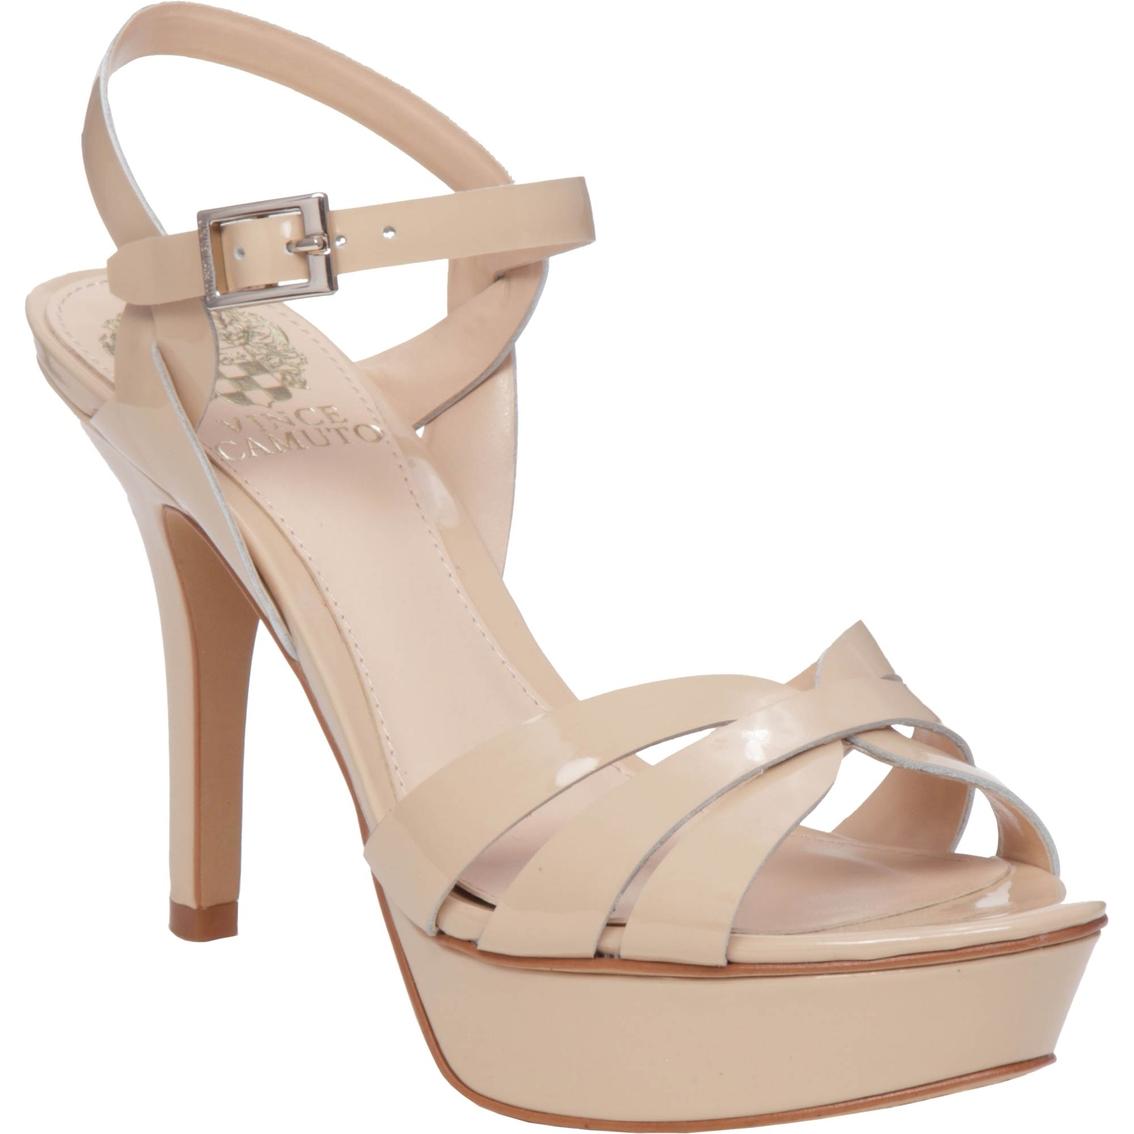 Vince Camuto Peppa Platform Sandals